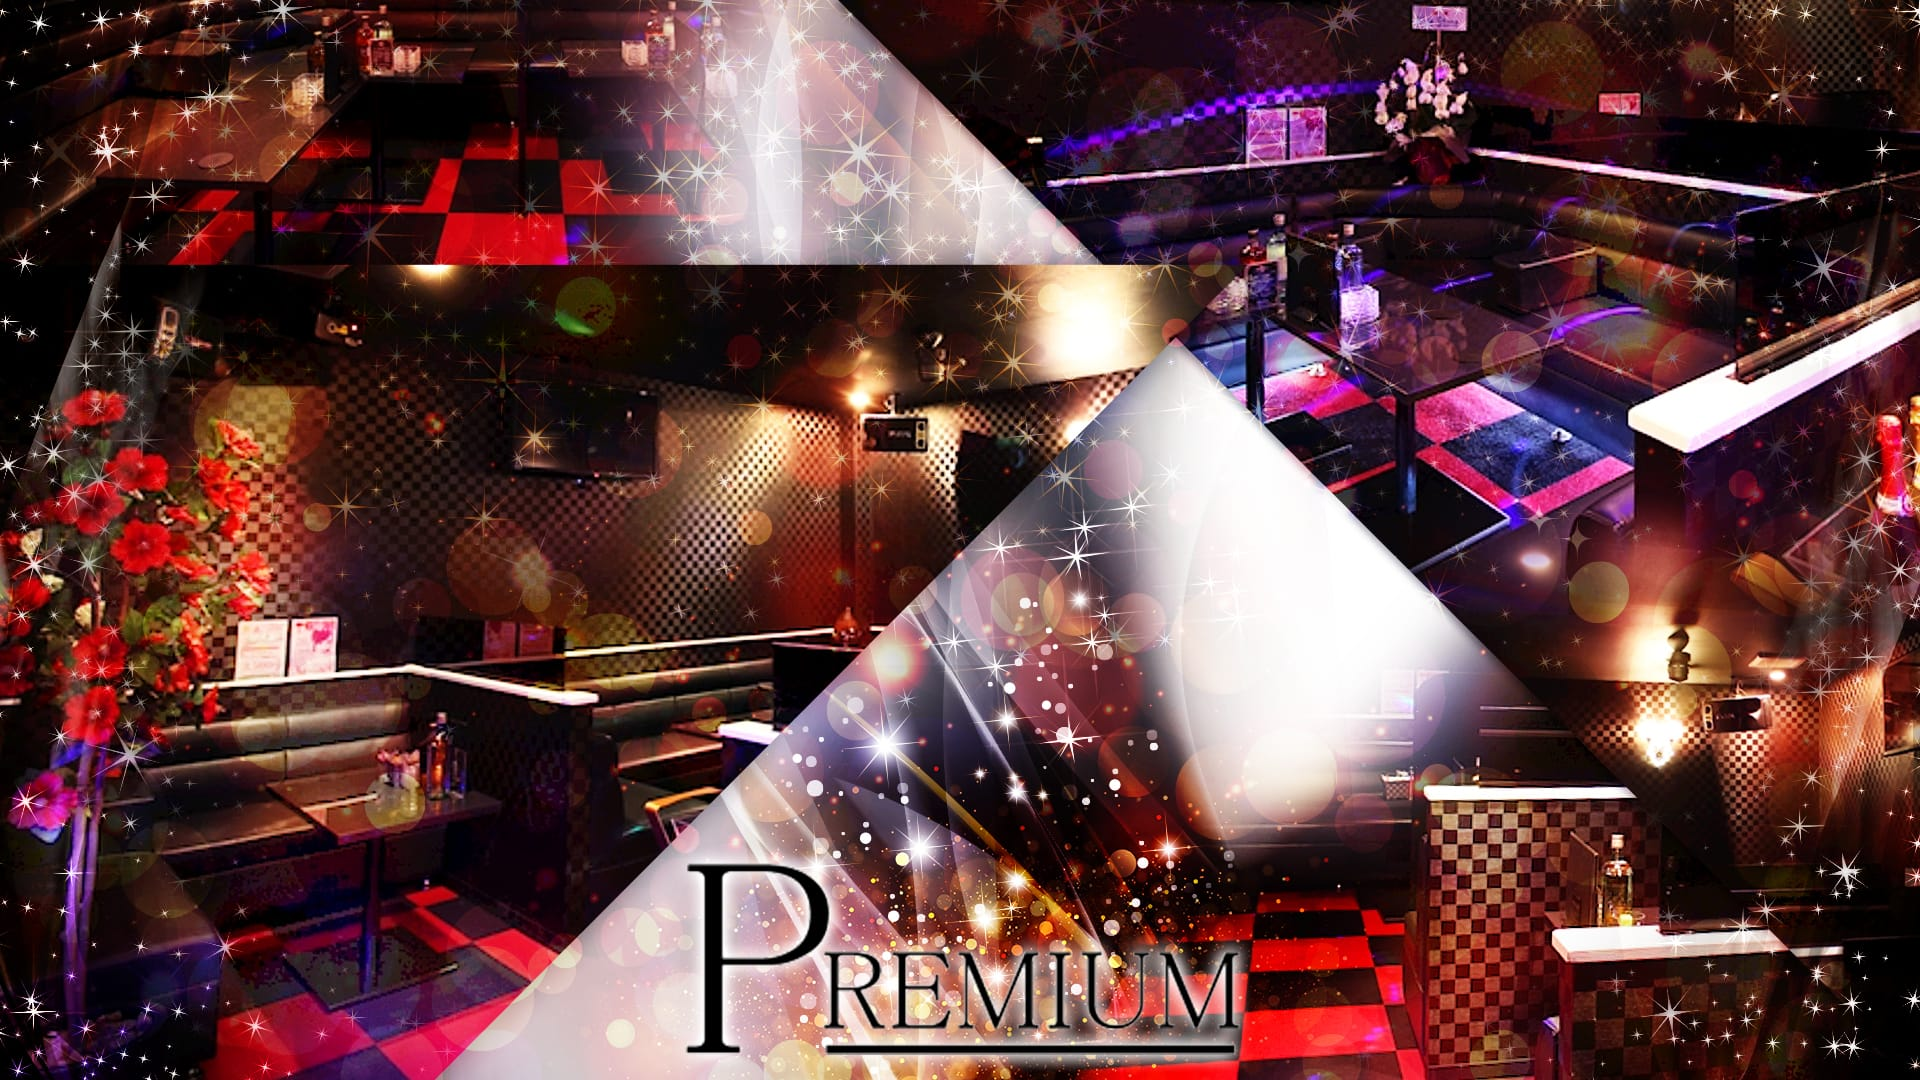 Club PREMIUM (クラブ プレミアム) 可児キャバクラ TOP画像